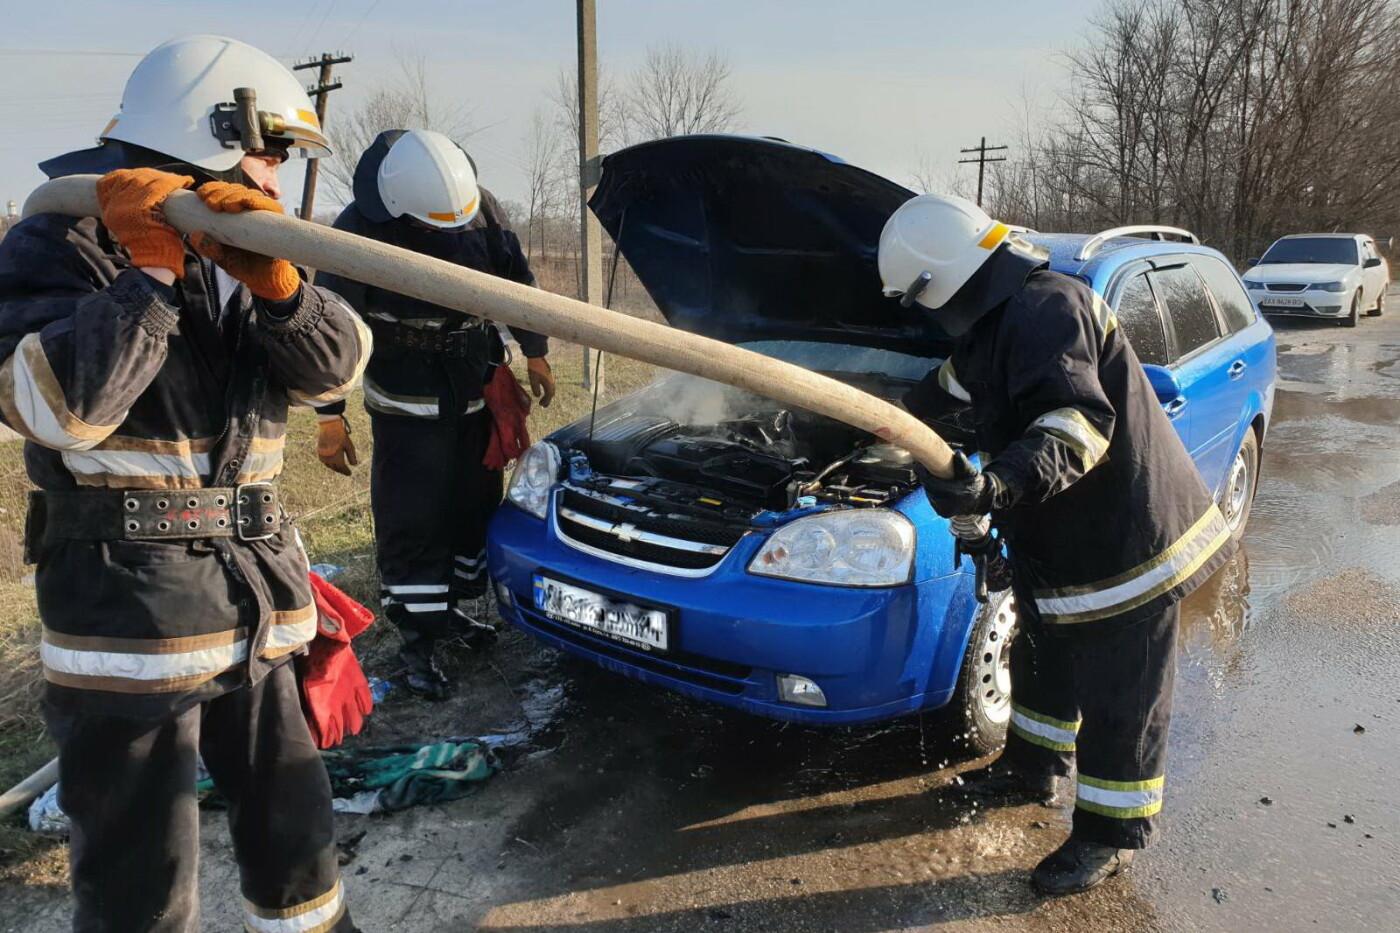 Под Харьковом во время движения загорелся «Chevrolet Lacetti», - ФОТО, фото-2